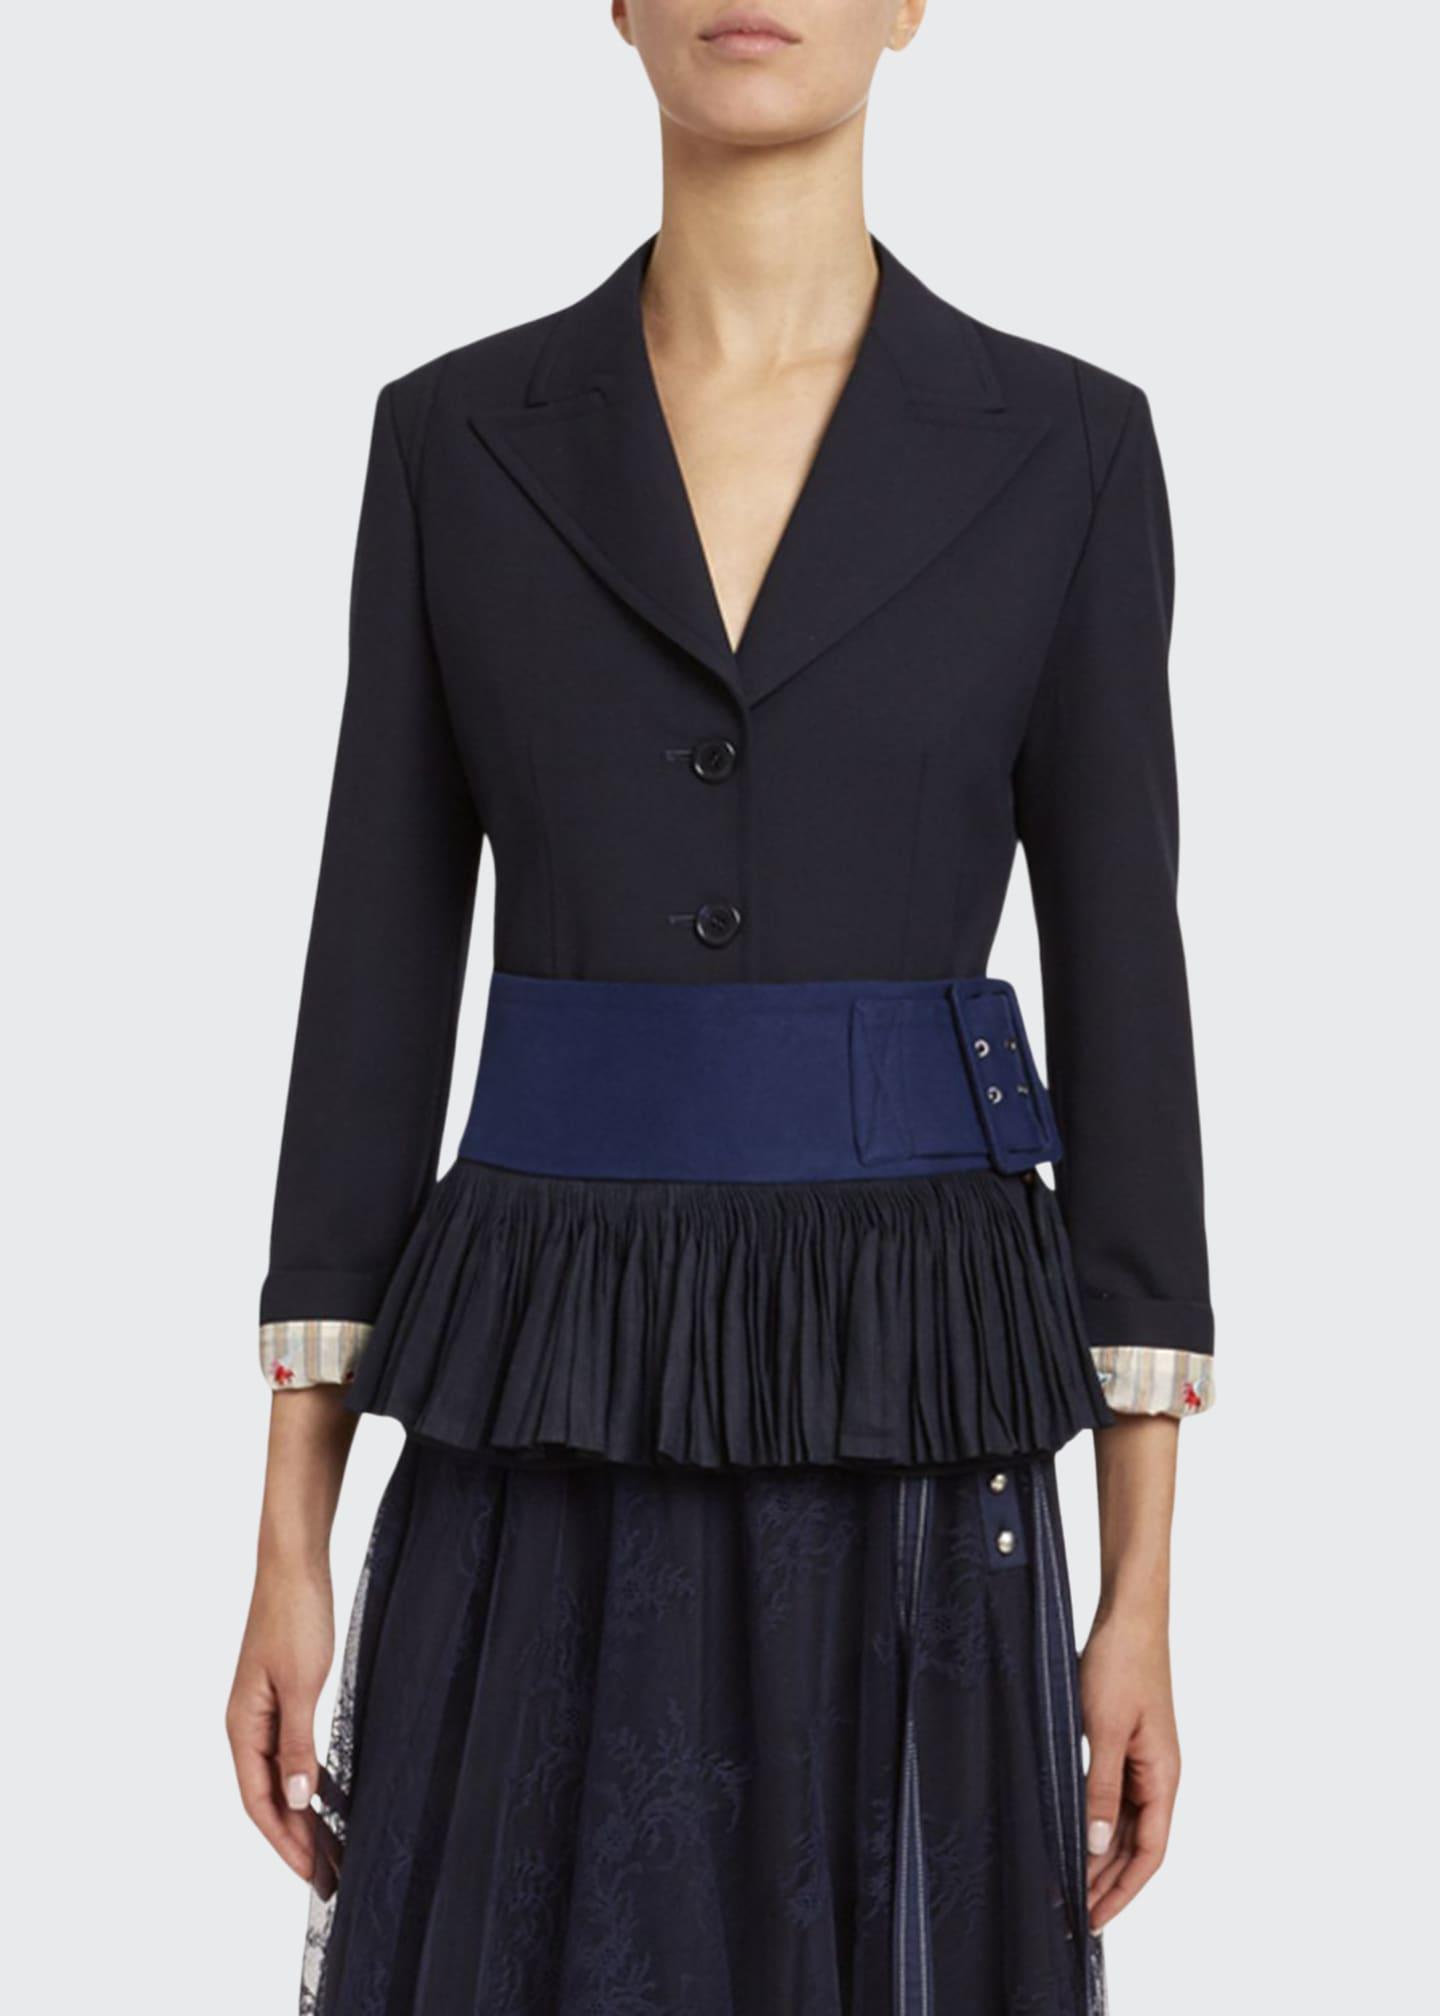 Chloe Stretch Wool Peplum Jacket